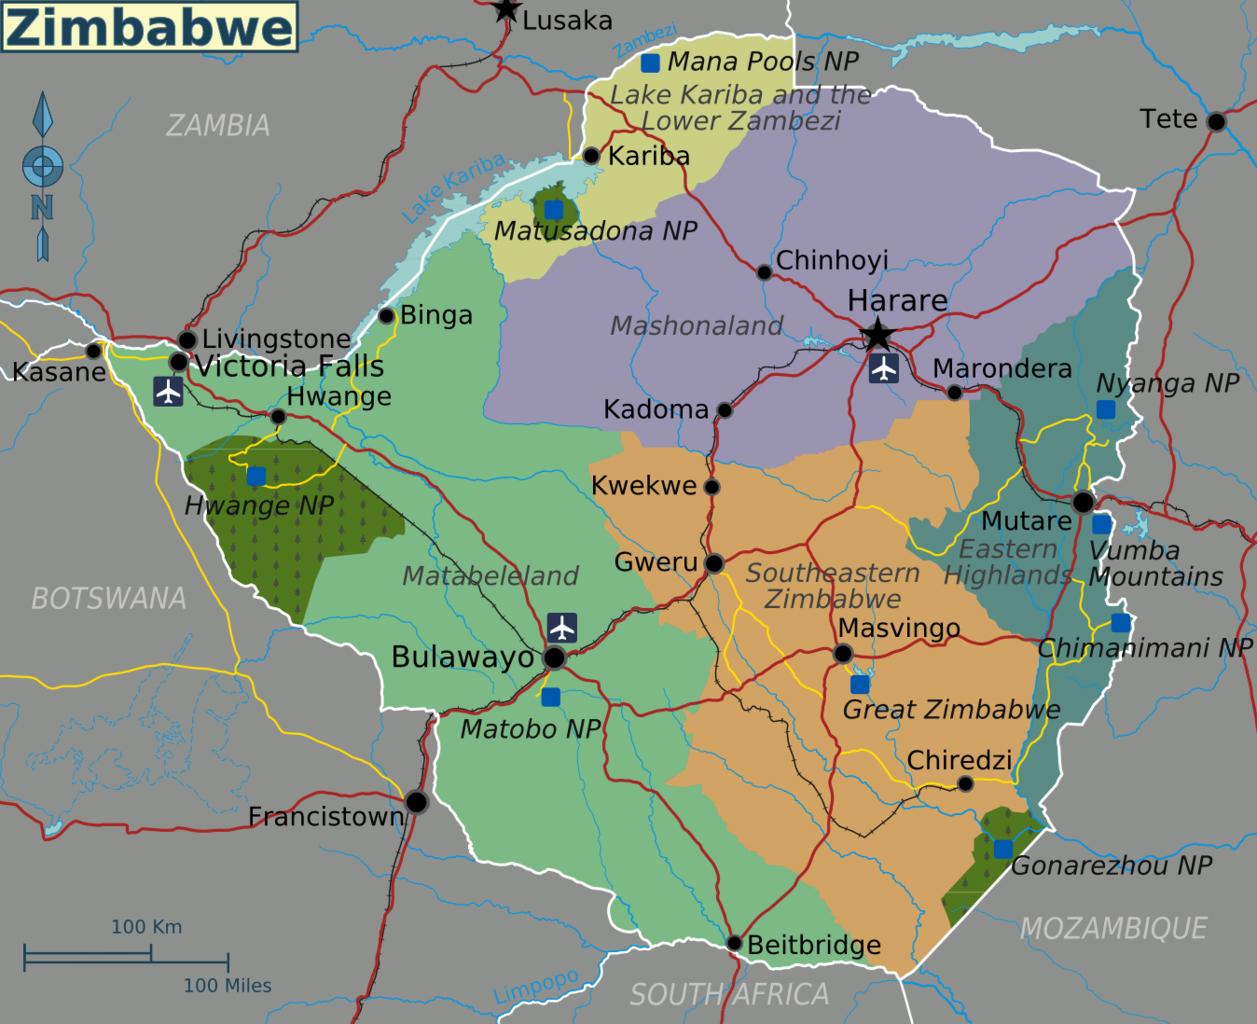 Map Of Africa Zimbabwe.Large Regions Map Of Zimbabwe Zimbabwe Africa Mapsland Maps